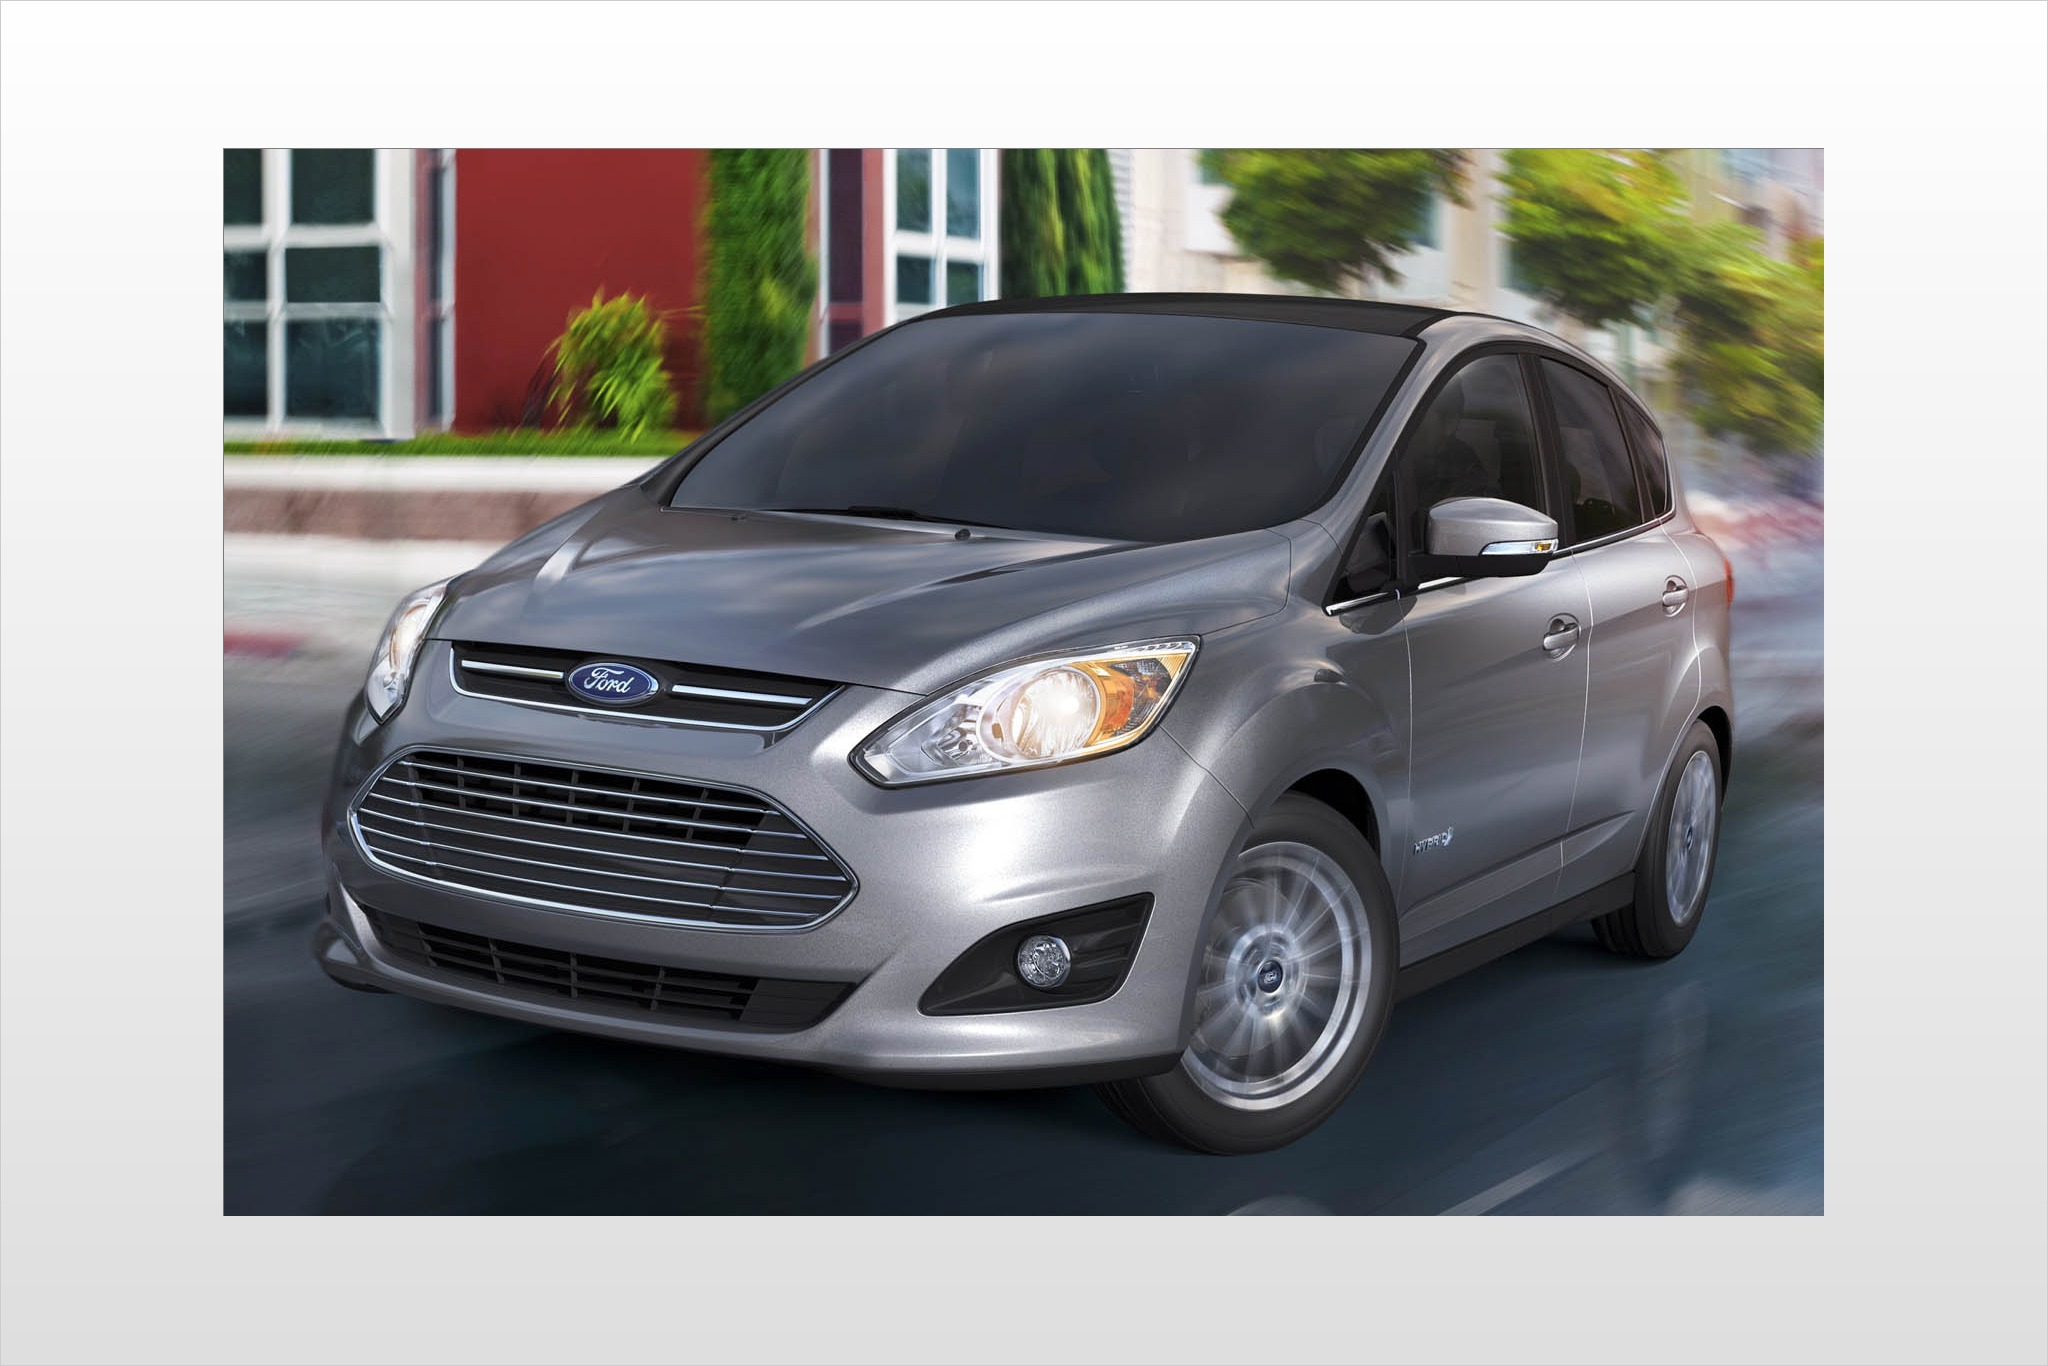 2013 Ford C Max Energi Image 4